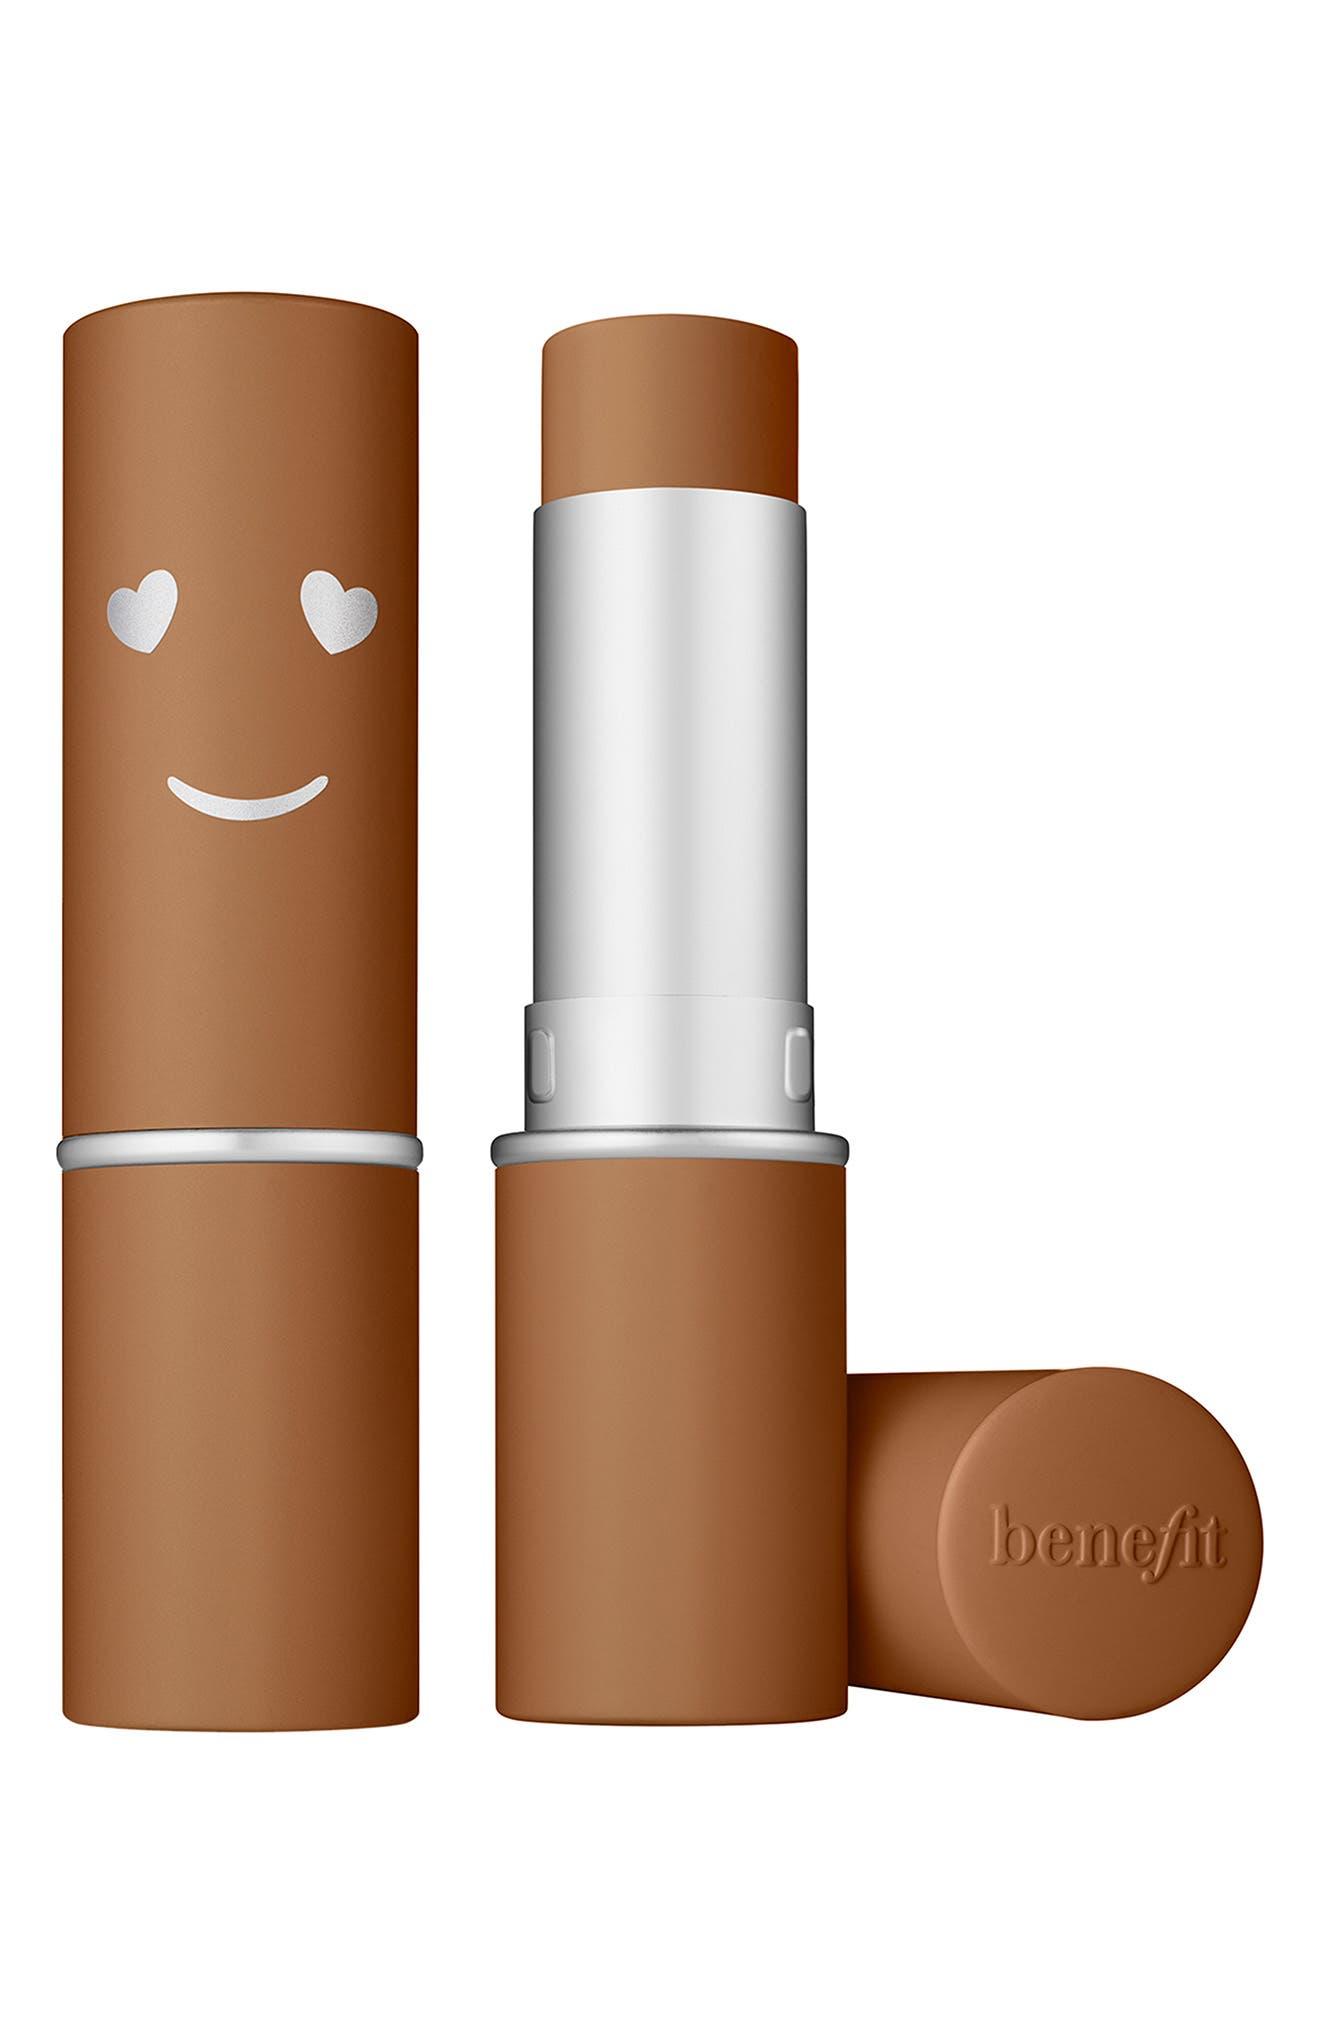 Benefit Hello Happy Air Stick Foundation Spf 20